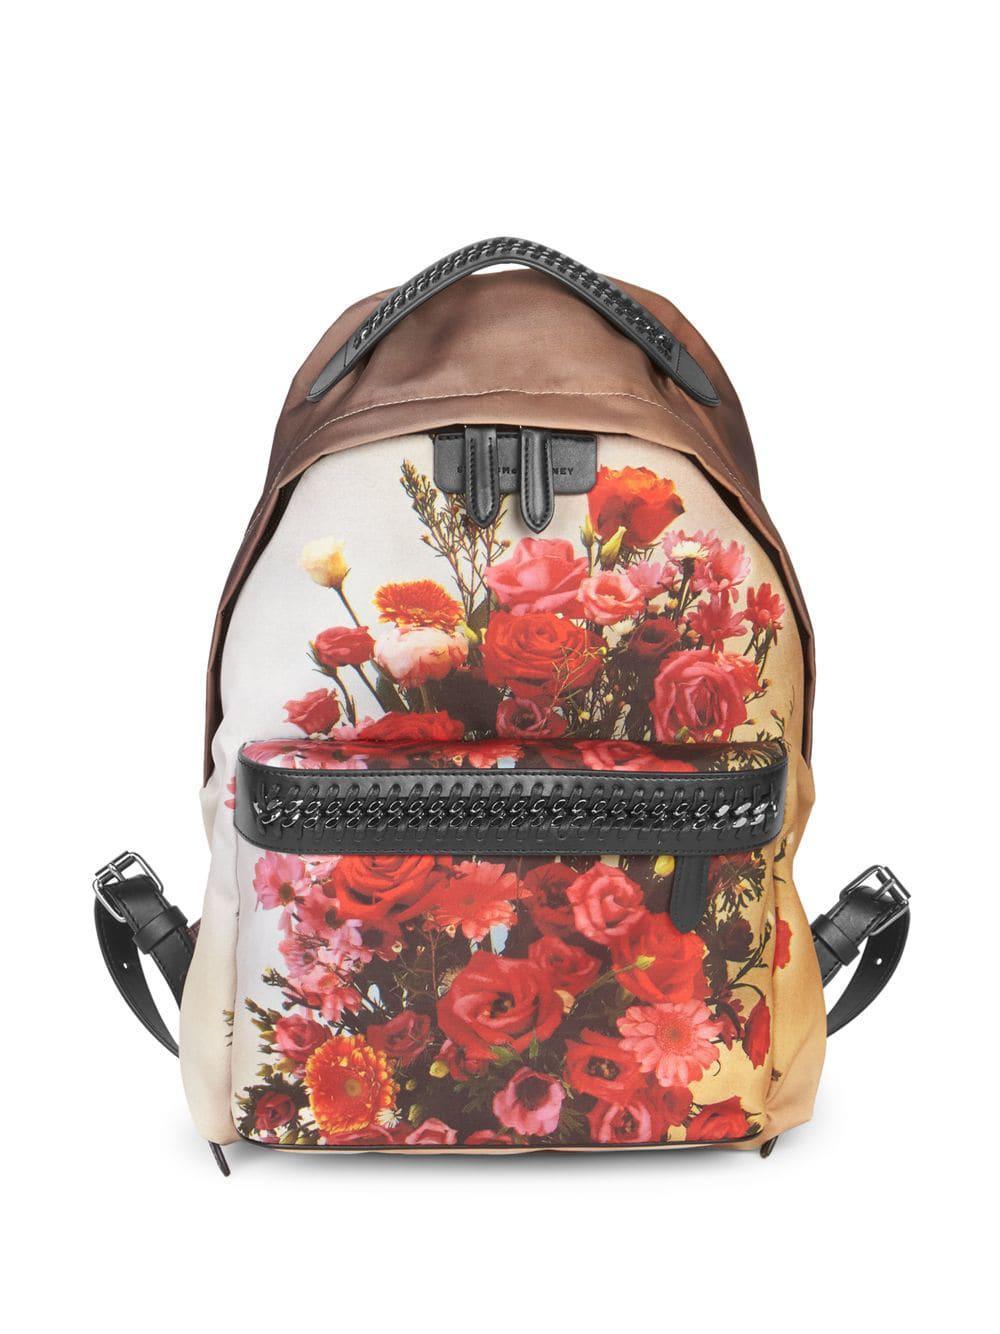 26f901635c Stella McCartney Floral Print Backpack - Save 40% - Lyst